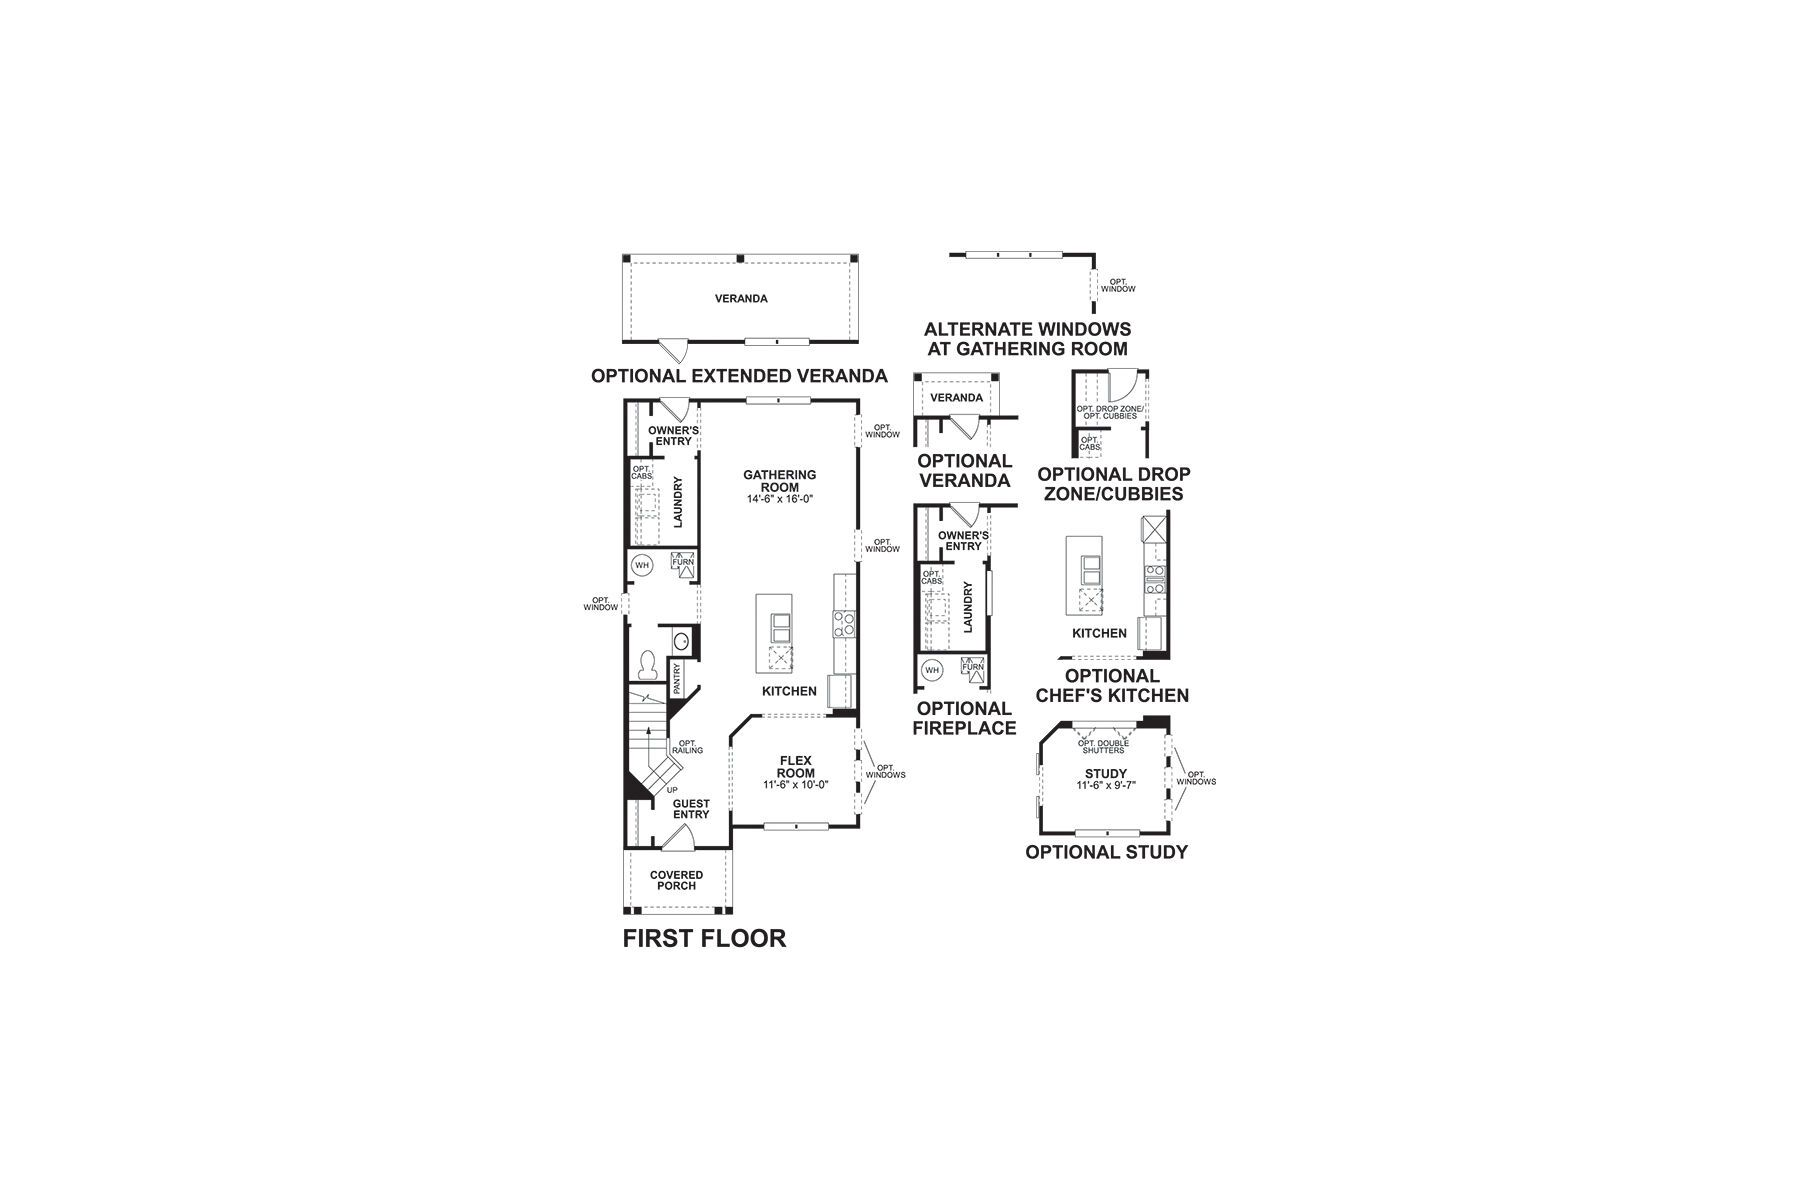 r1750 First Floor